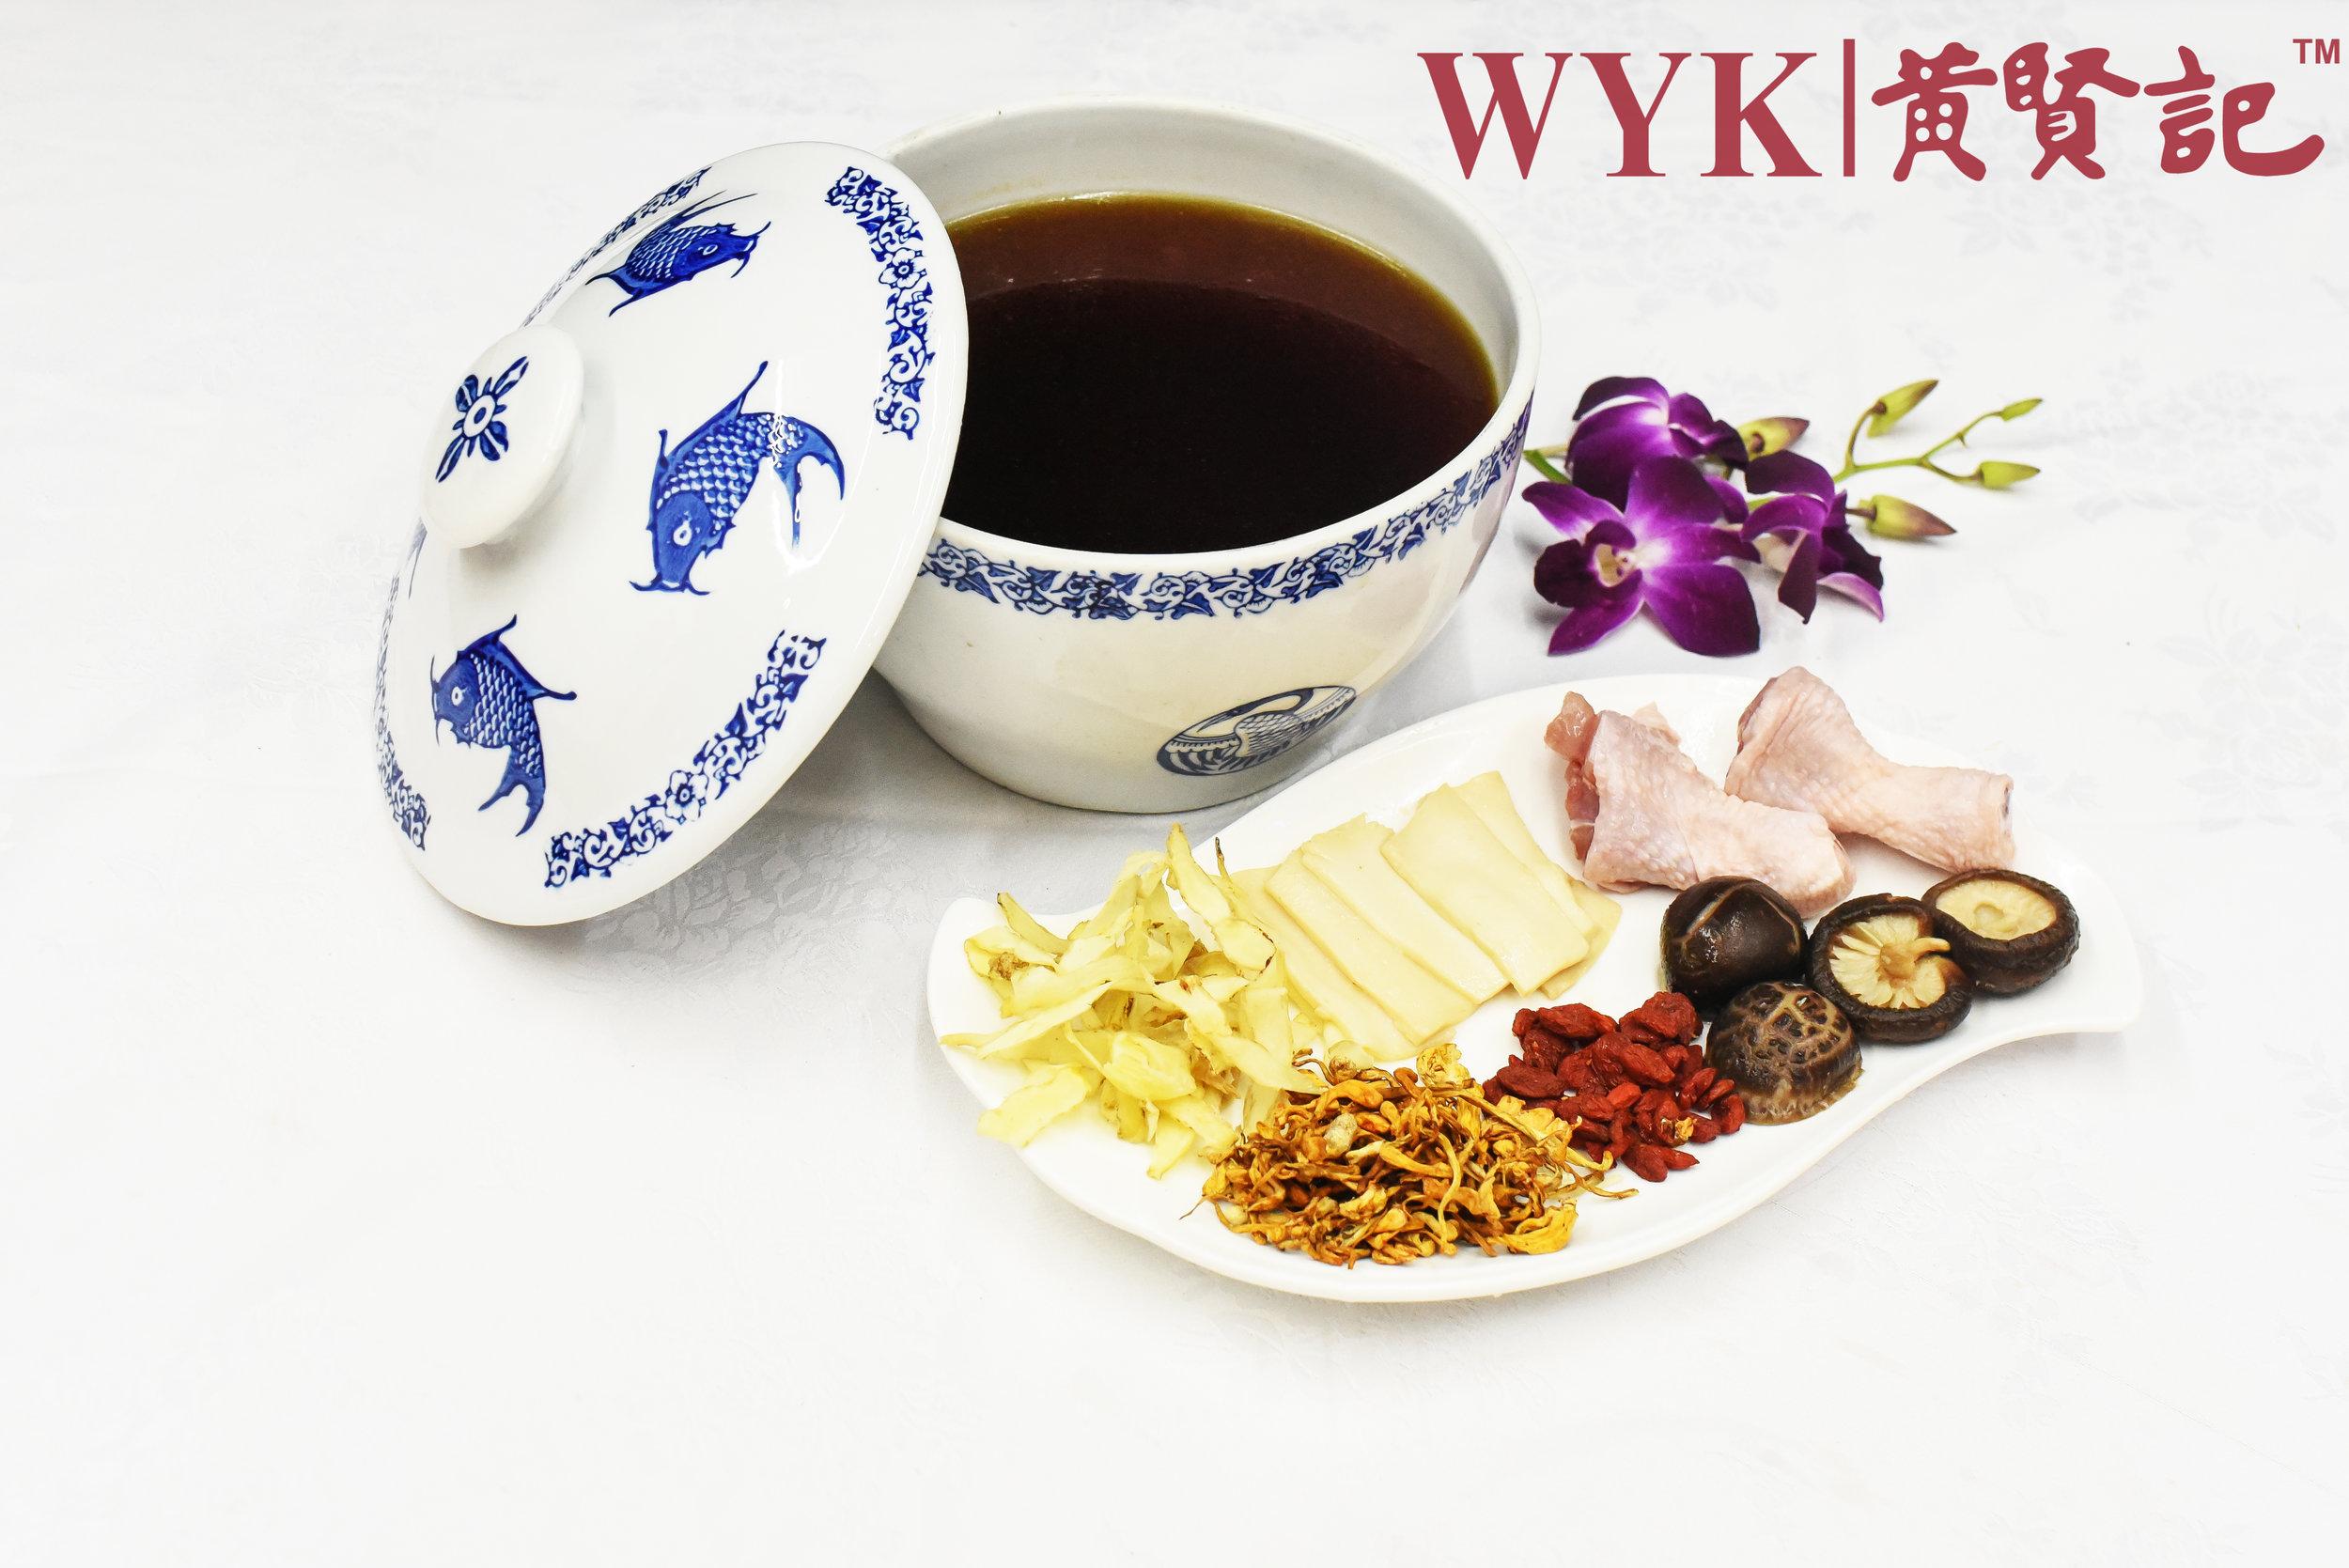 滋补虫草花炖鸡 Chicken Soup With Cordyceps flower.jpg